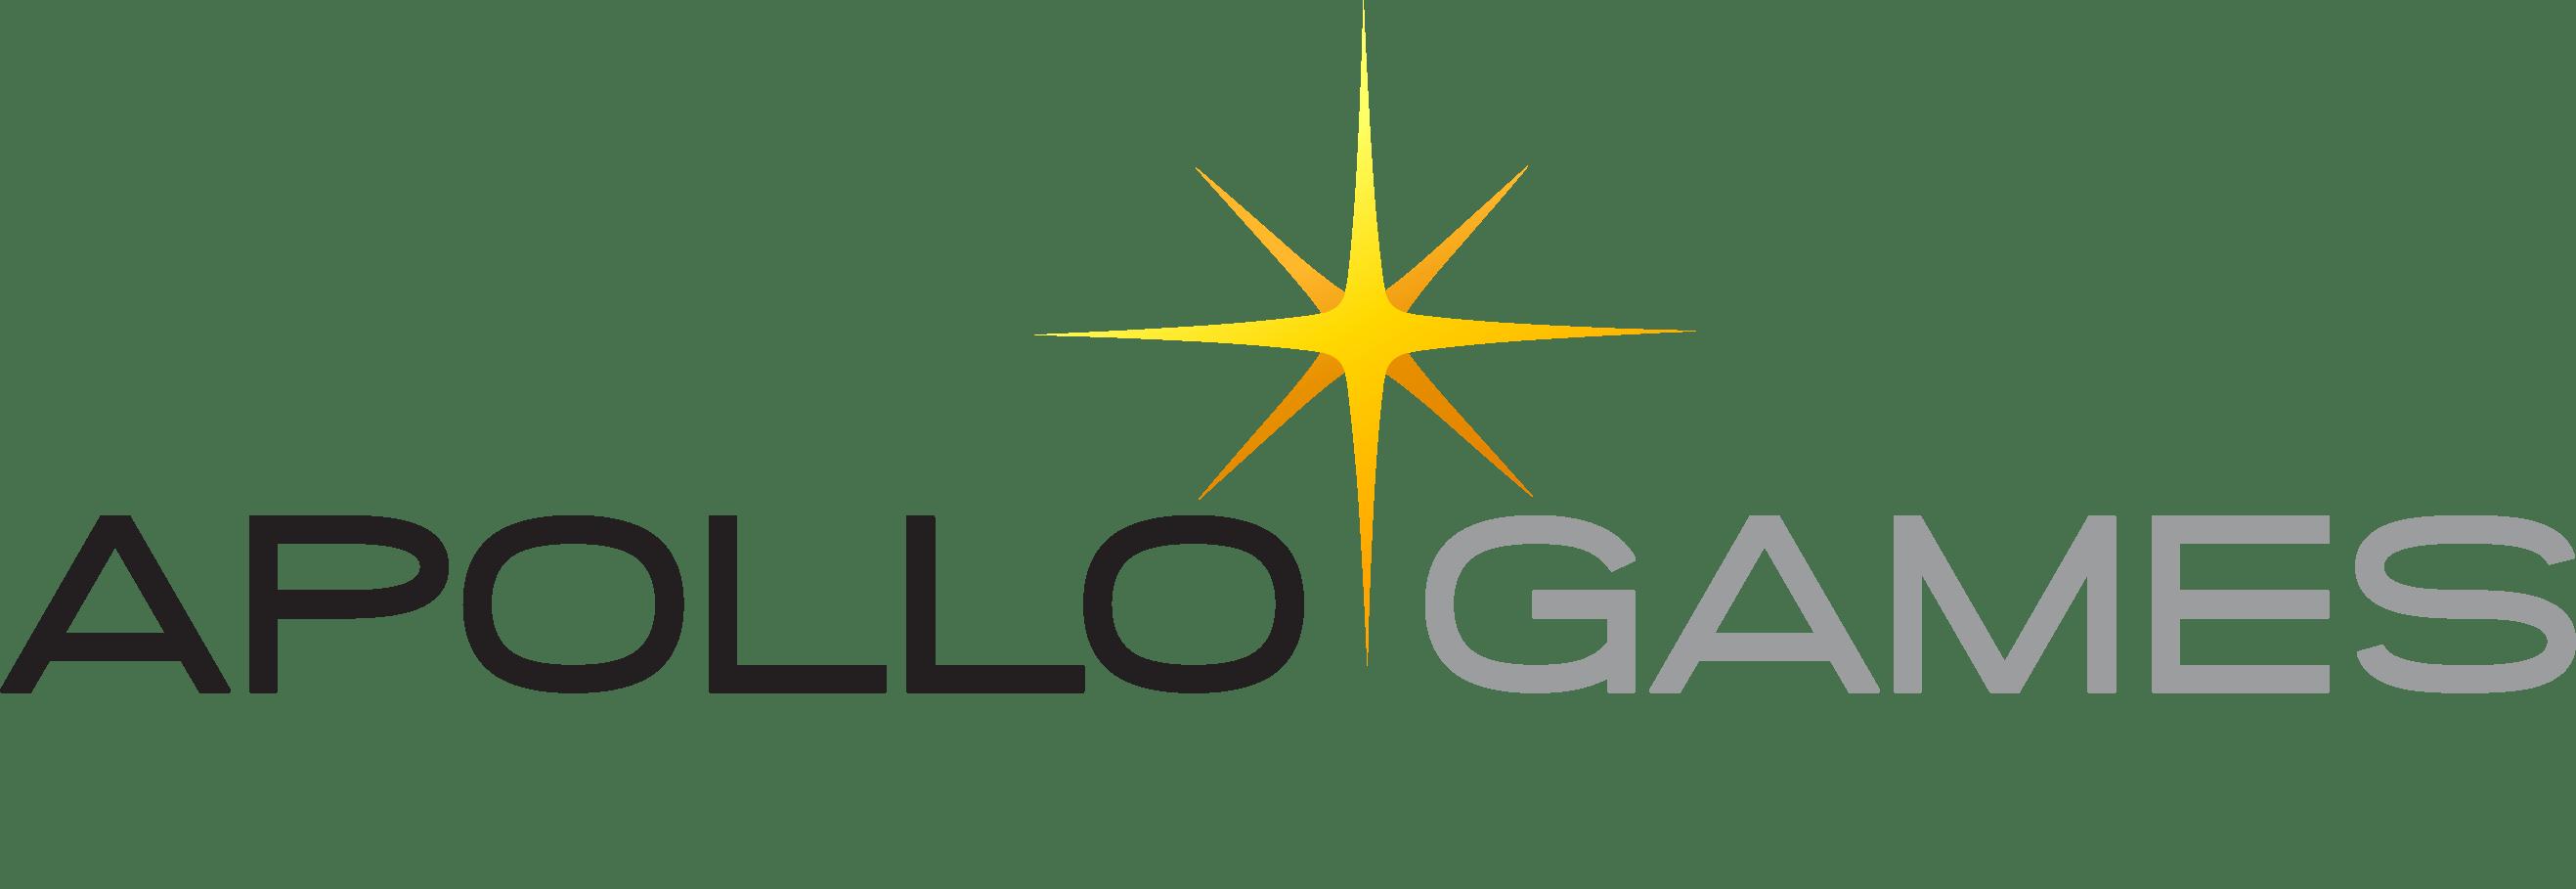 Apollo Games juegos